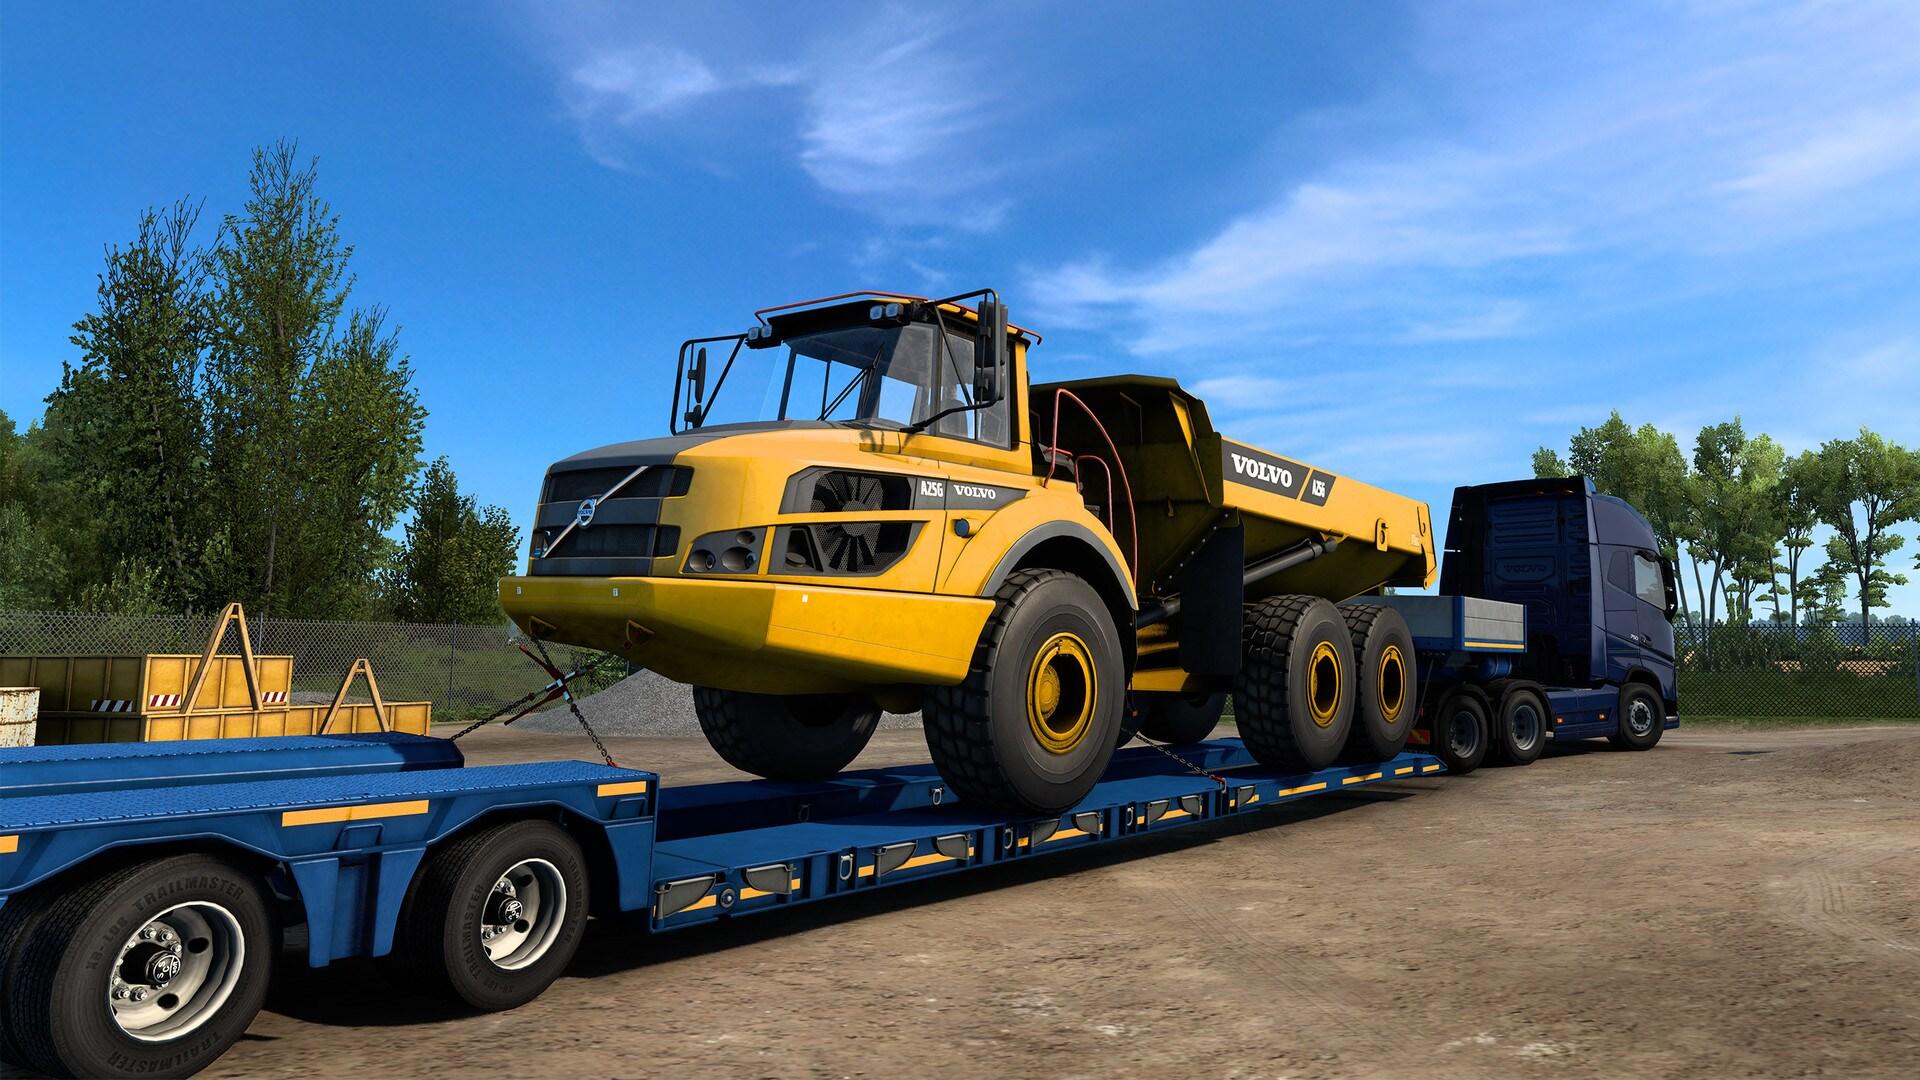 Euro Truck Simulator 2 - Volvo Construction Equipment (PC) - Steam Gift - GLOBAL - 3